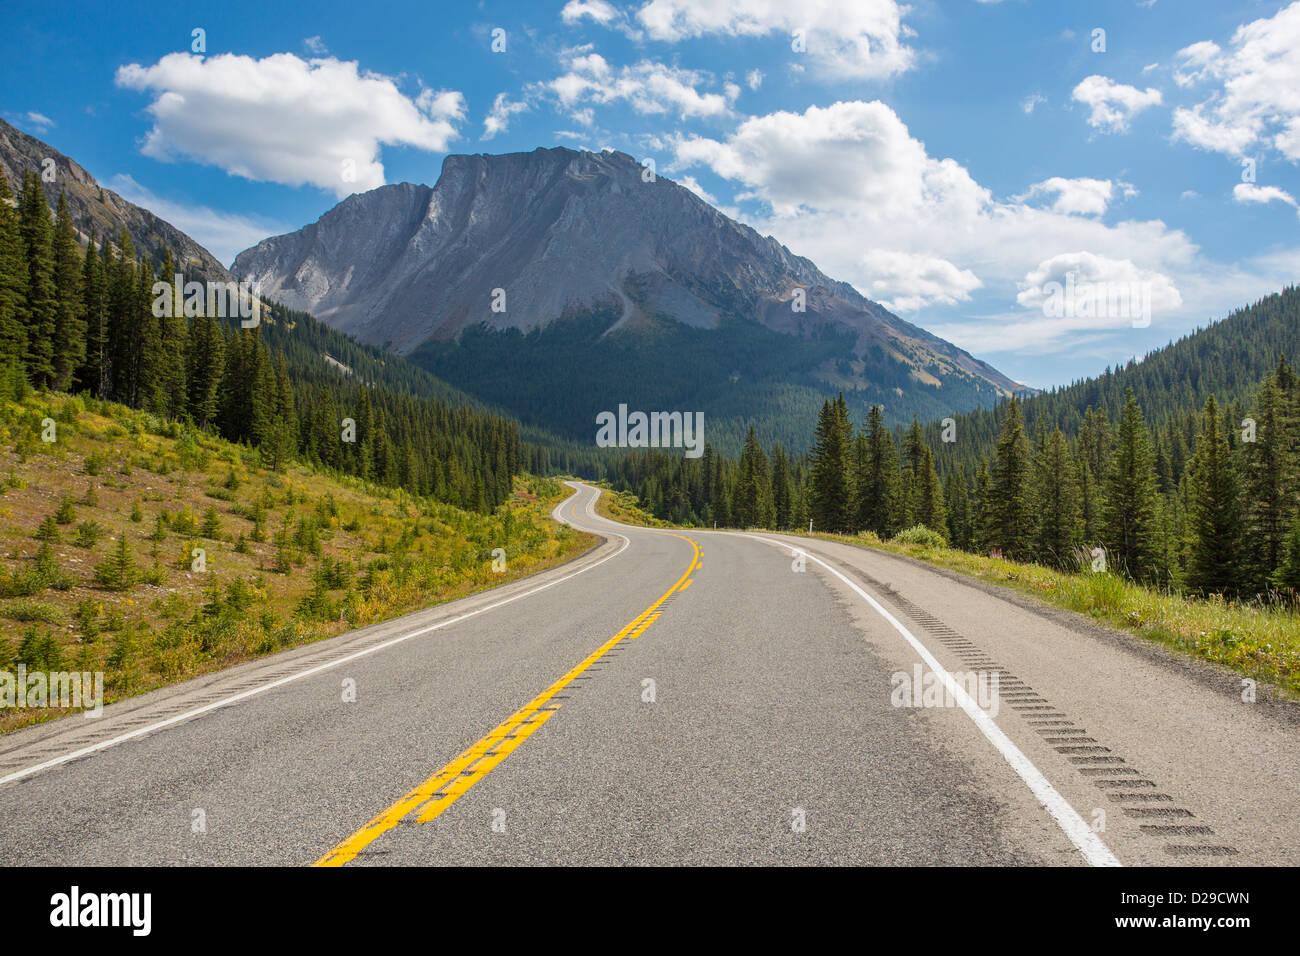 Route 40 in Kananaskis Country in Alberta Canada - Stock Image